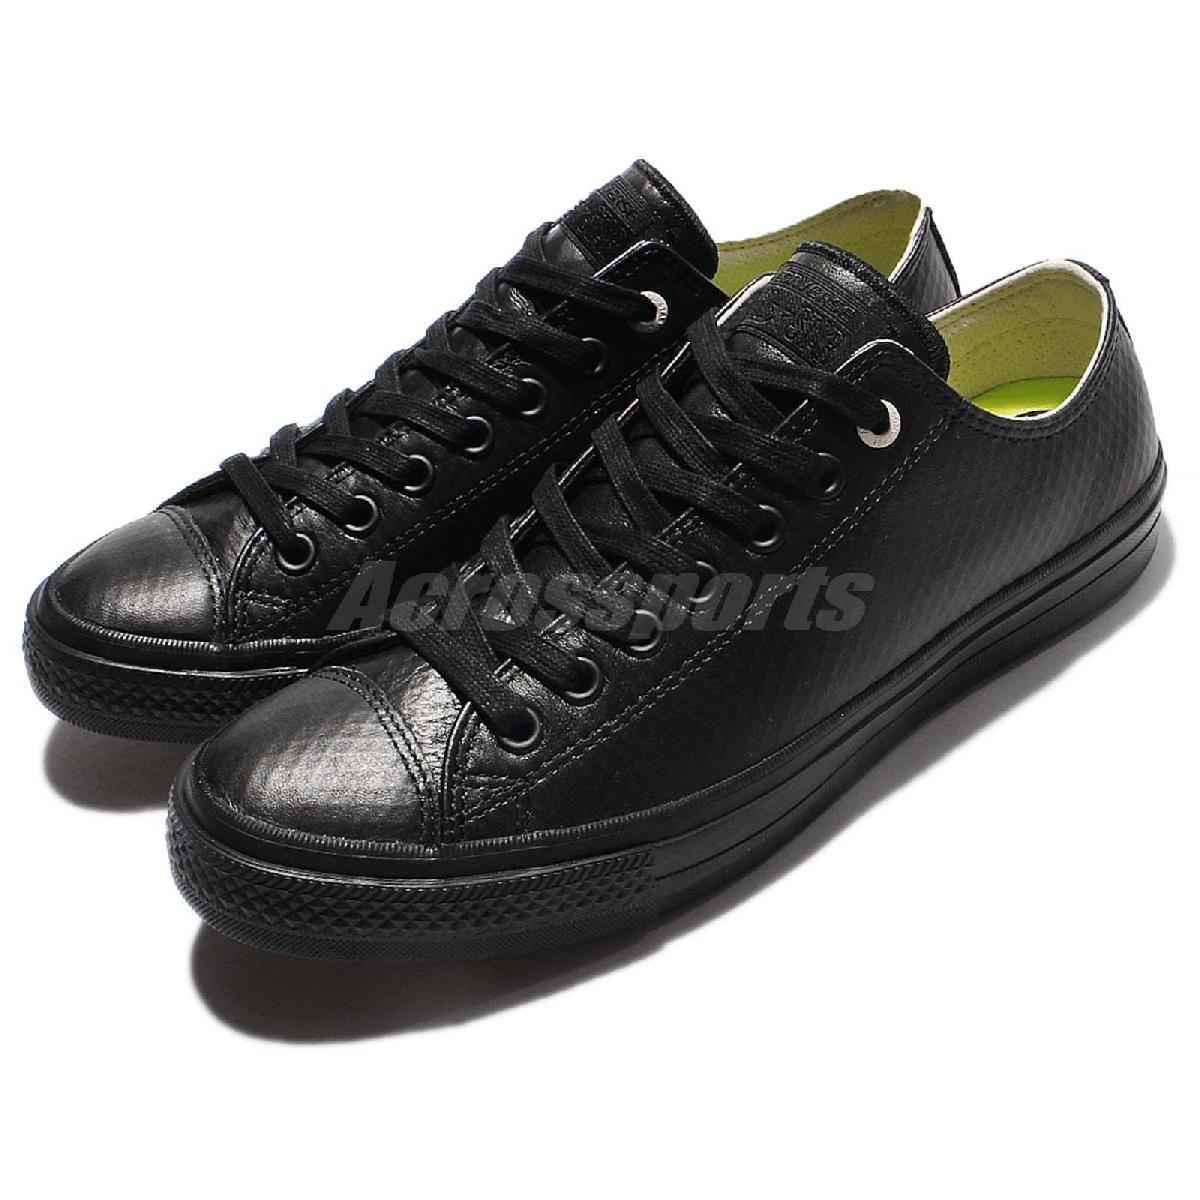 Converse Chuck Taylor All Star II黑全黑低筒皮革帆布鞋男鞋女鞋PUMP306 153556C